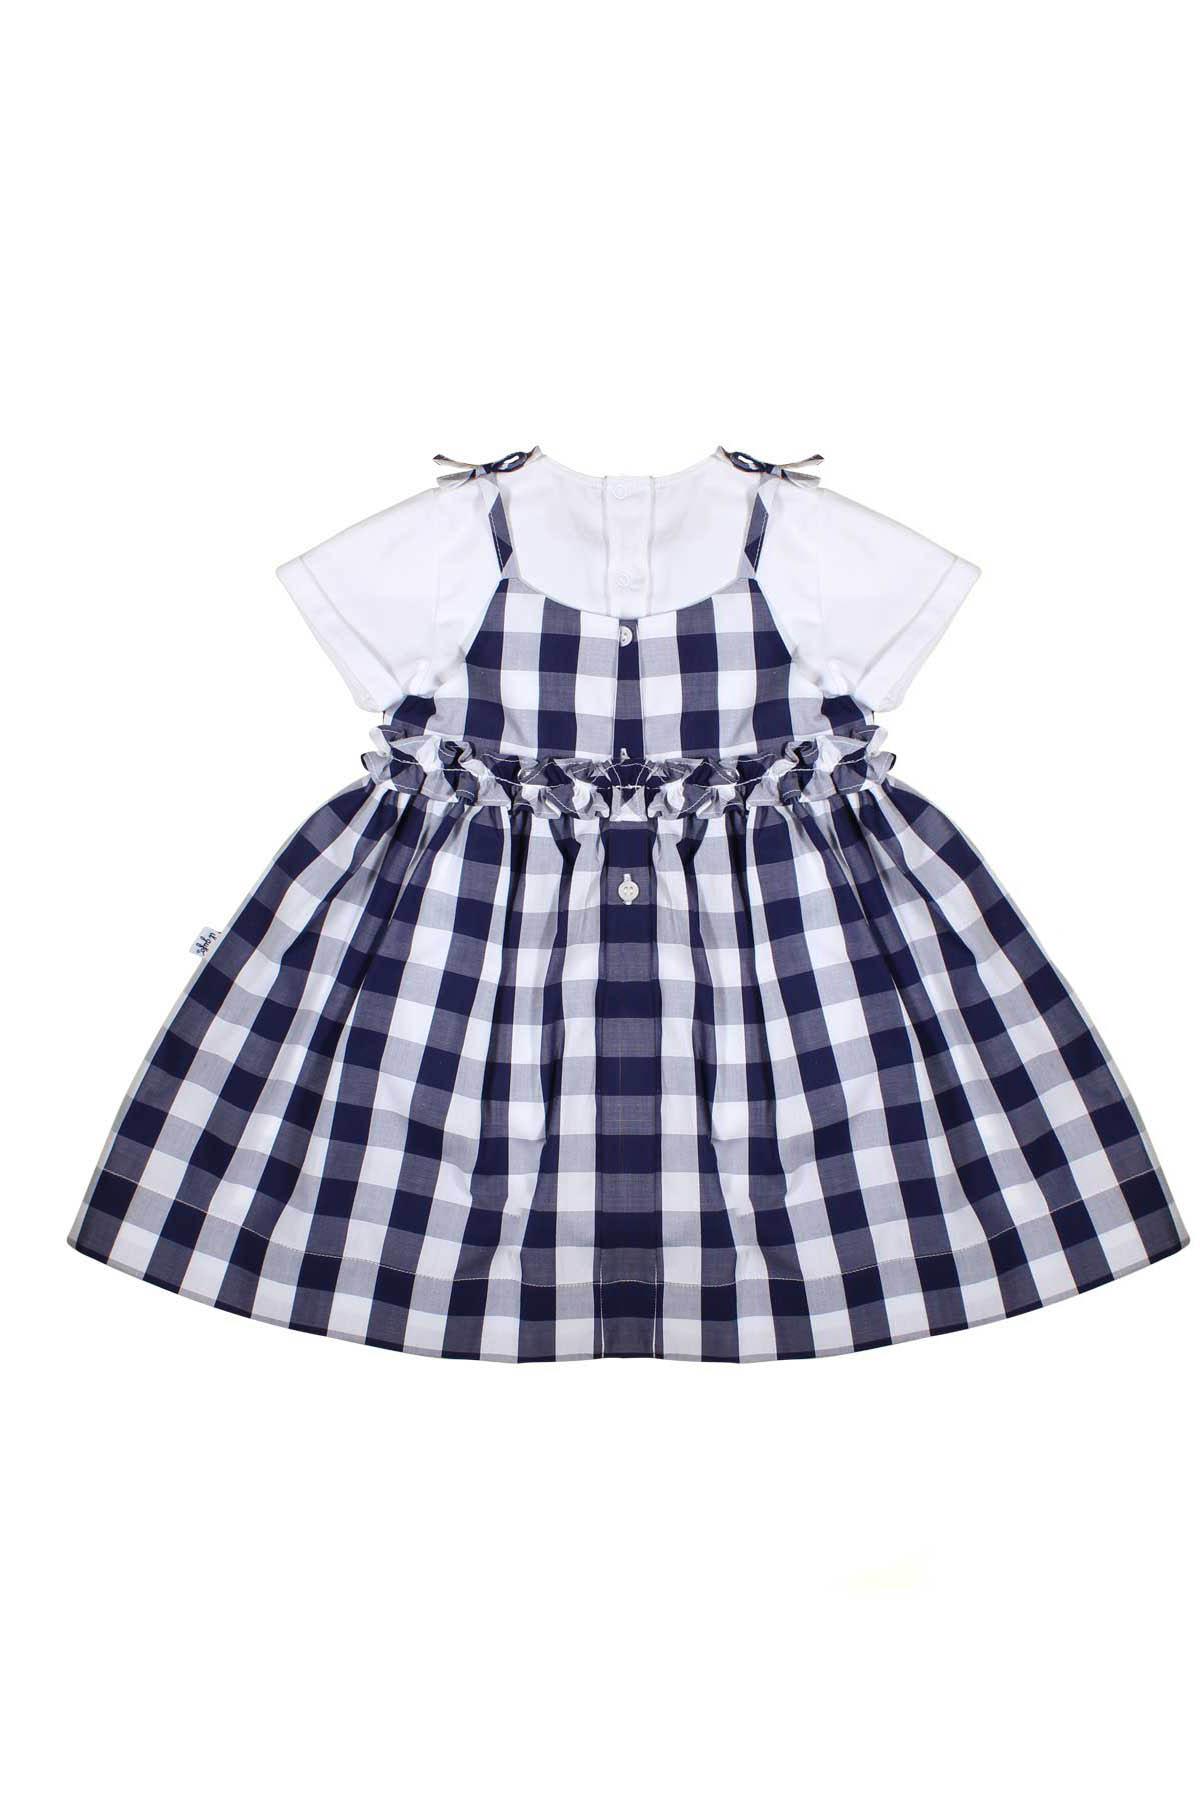 NEWBORN DRESS WITH WHITE SUIT IL GUFO JUNIOR IL GUFO | 42 | P19DP278C3105490